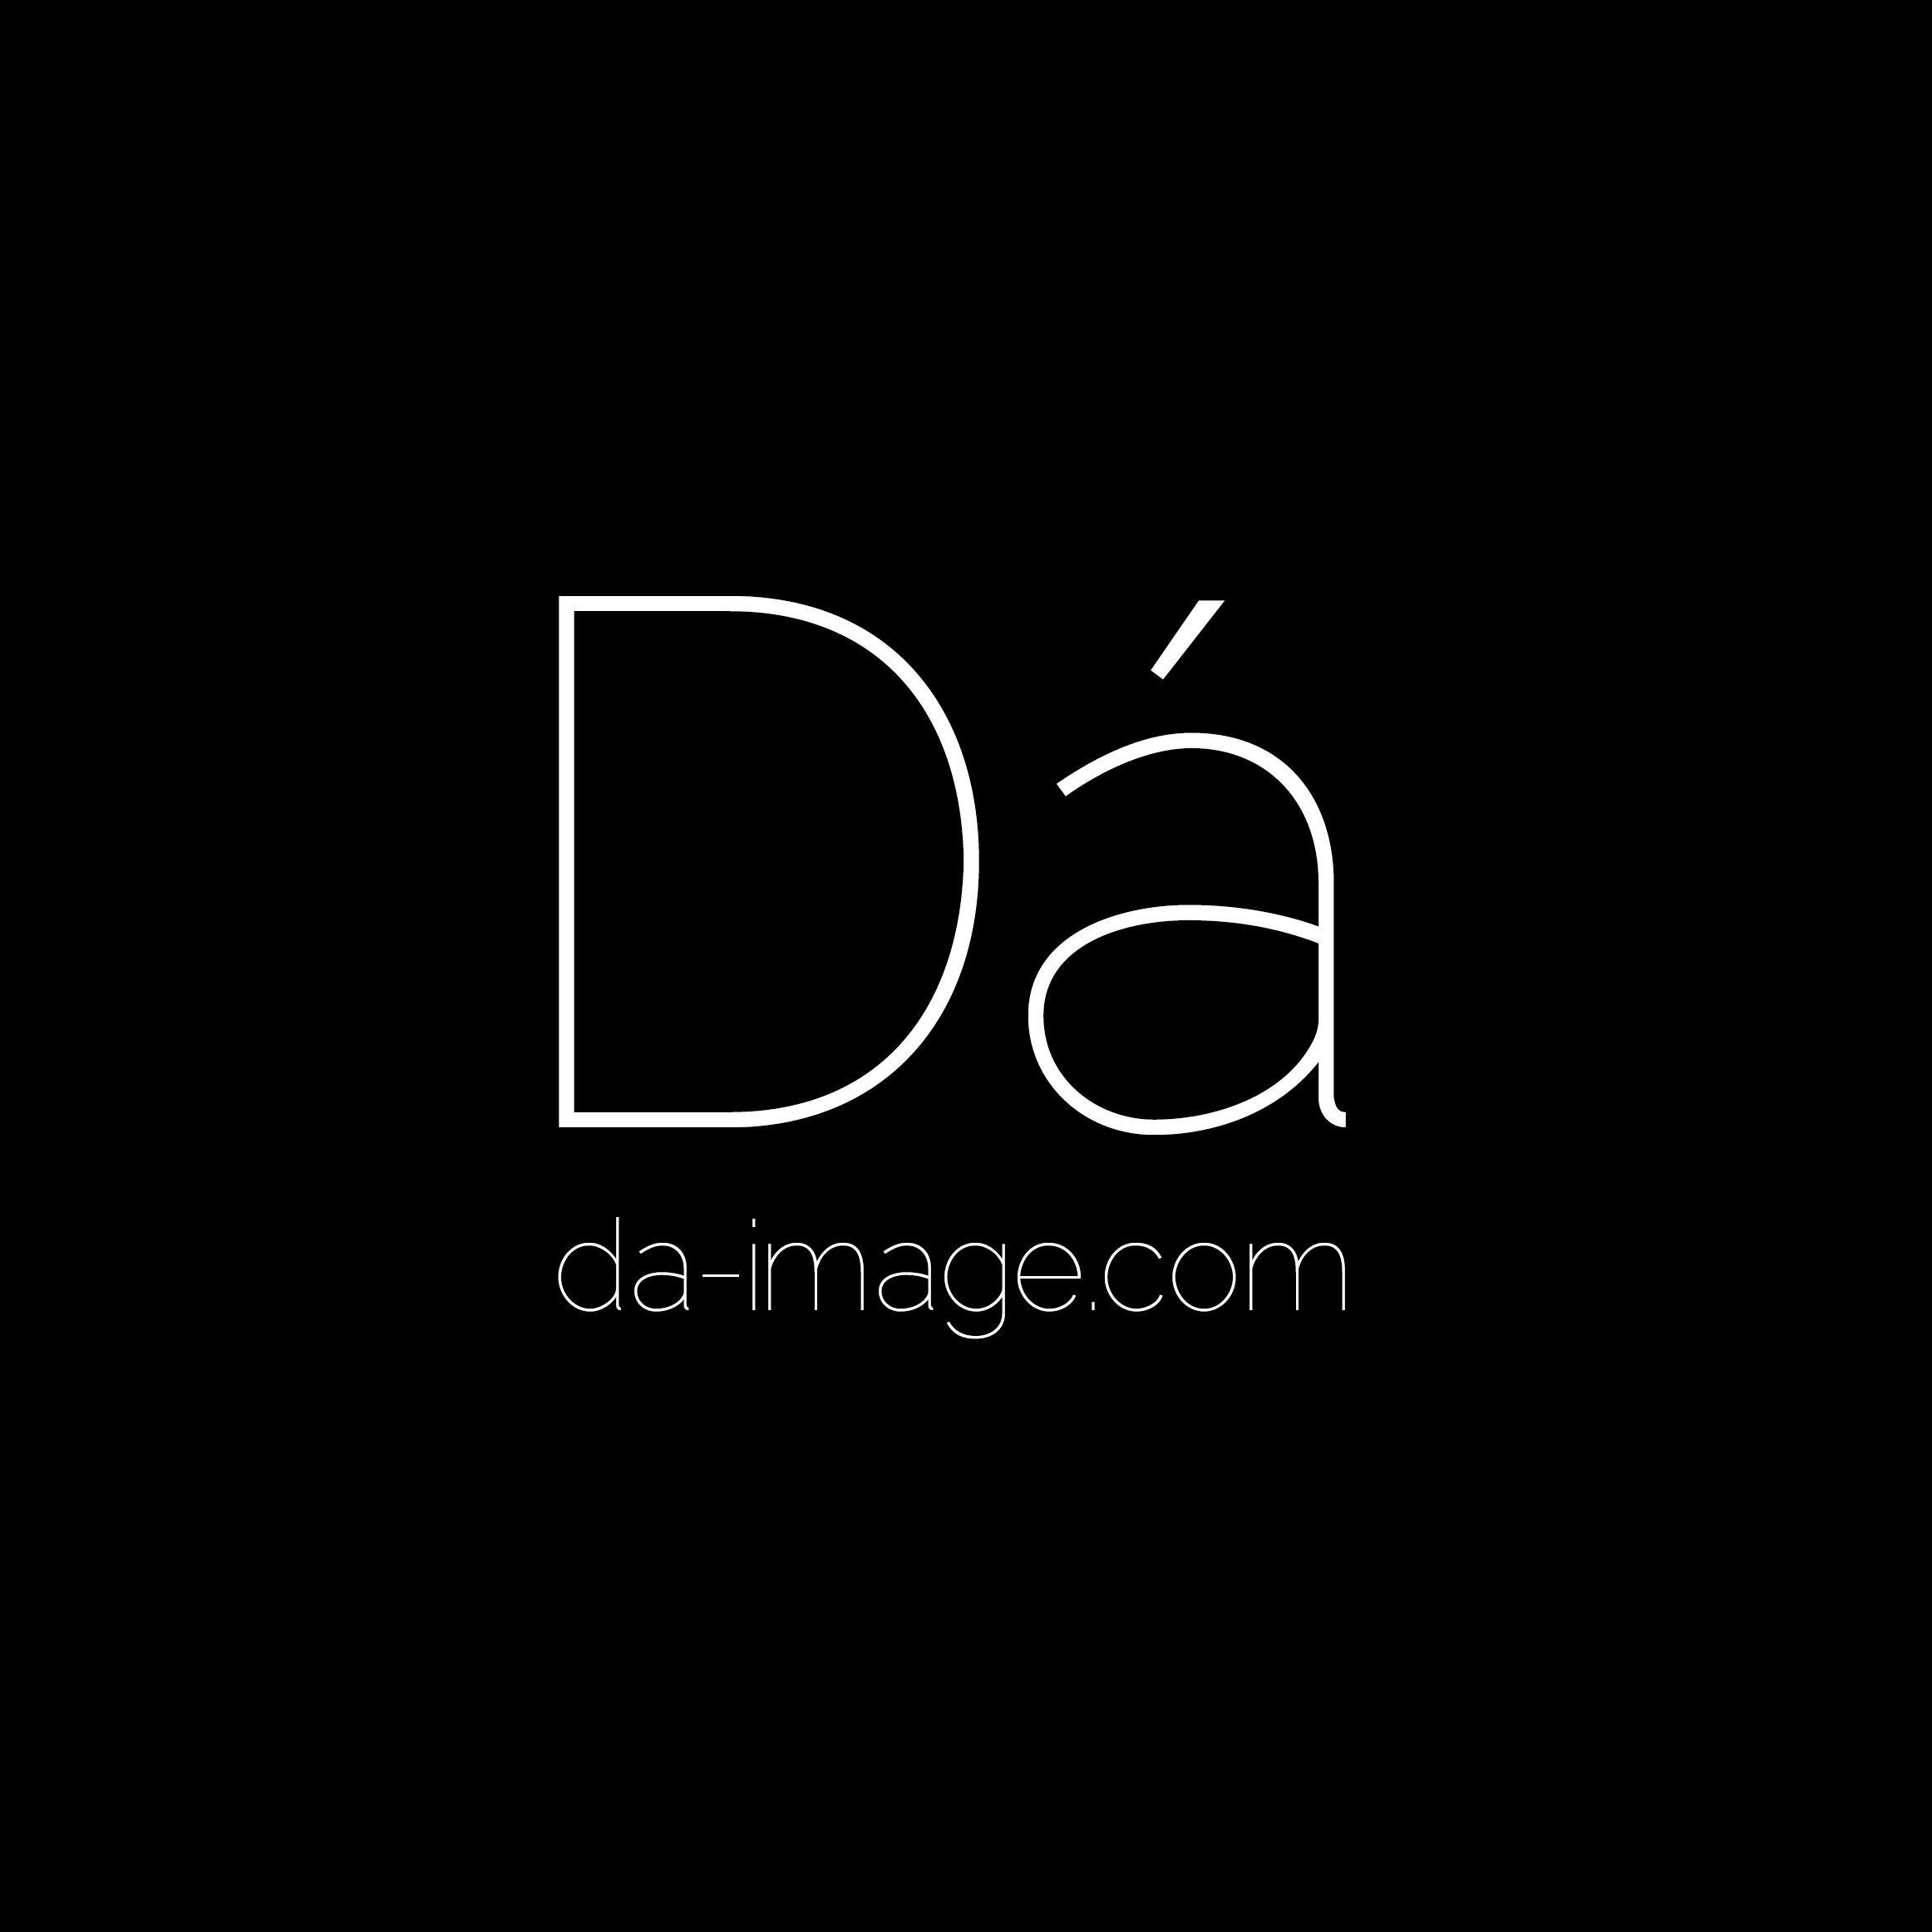 Da-image